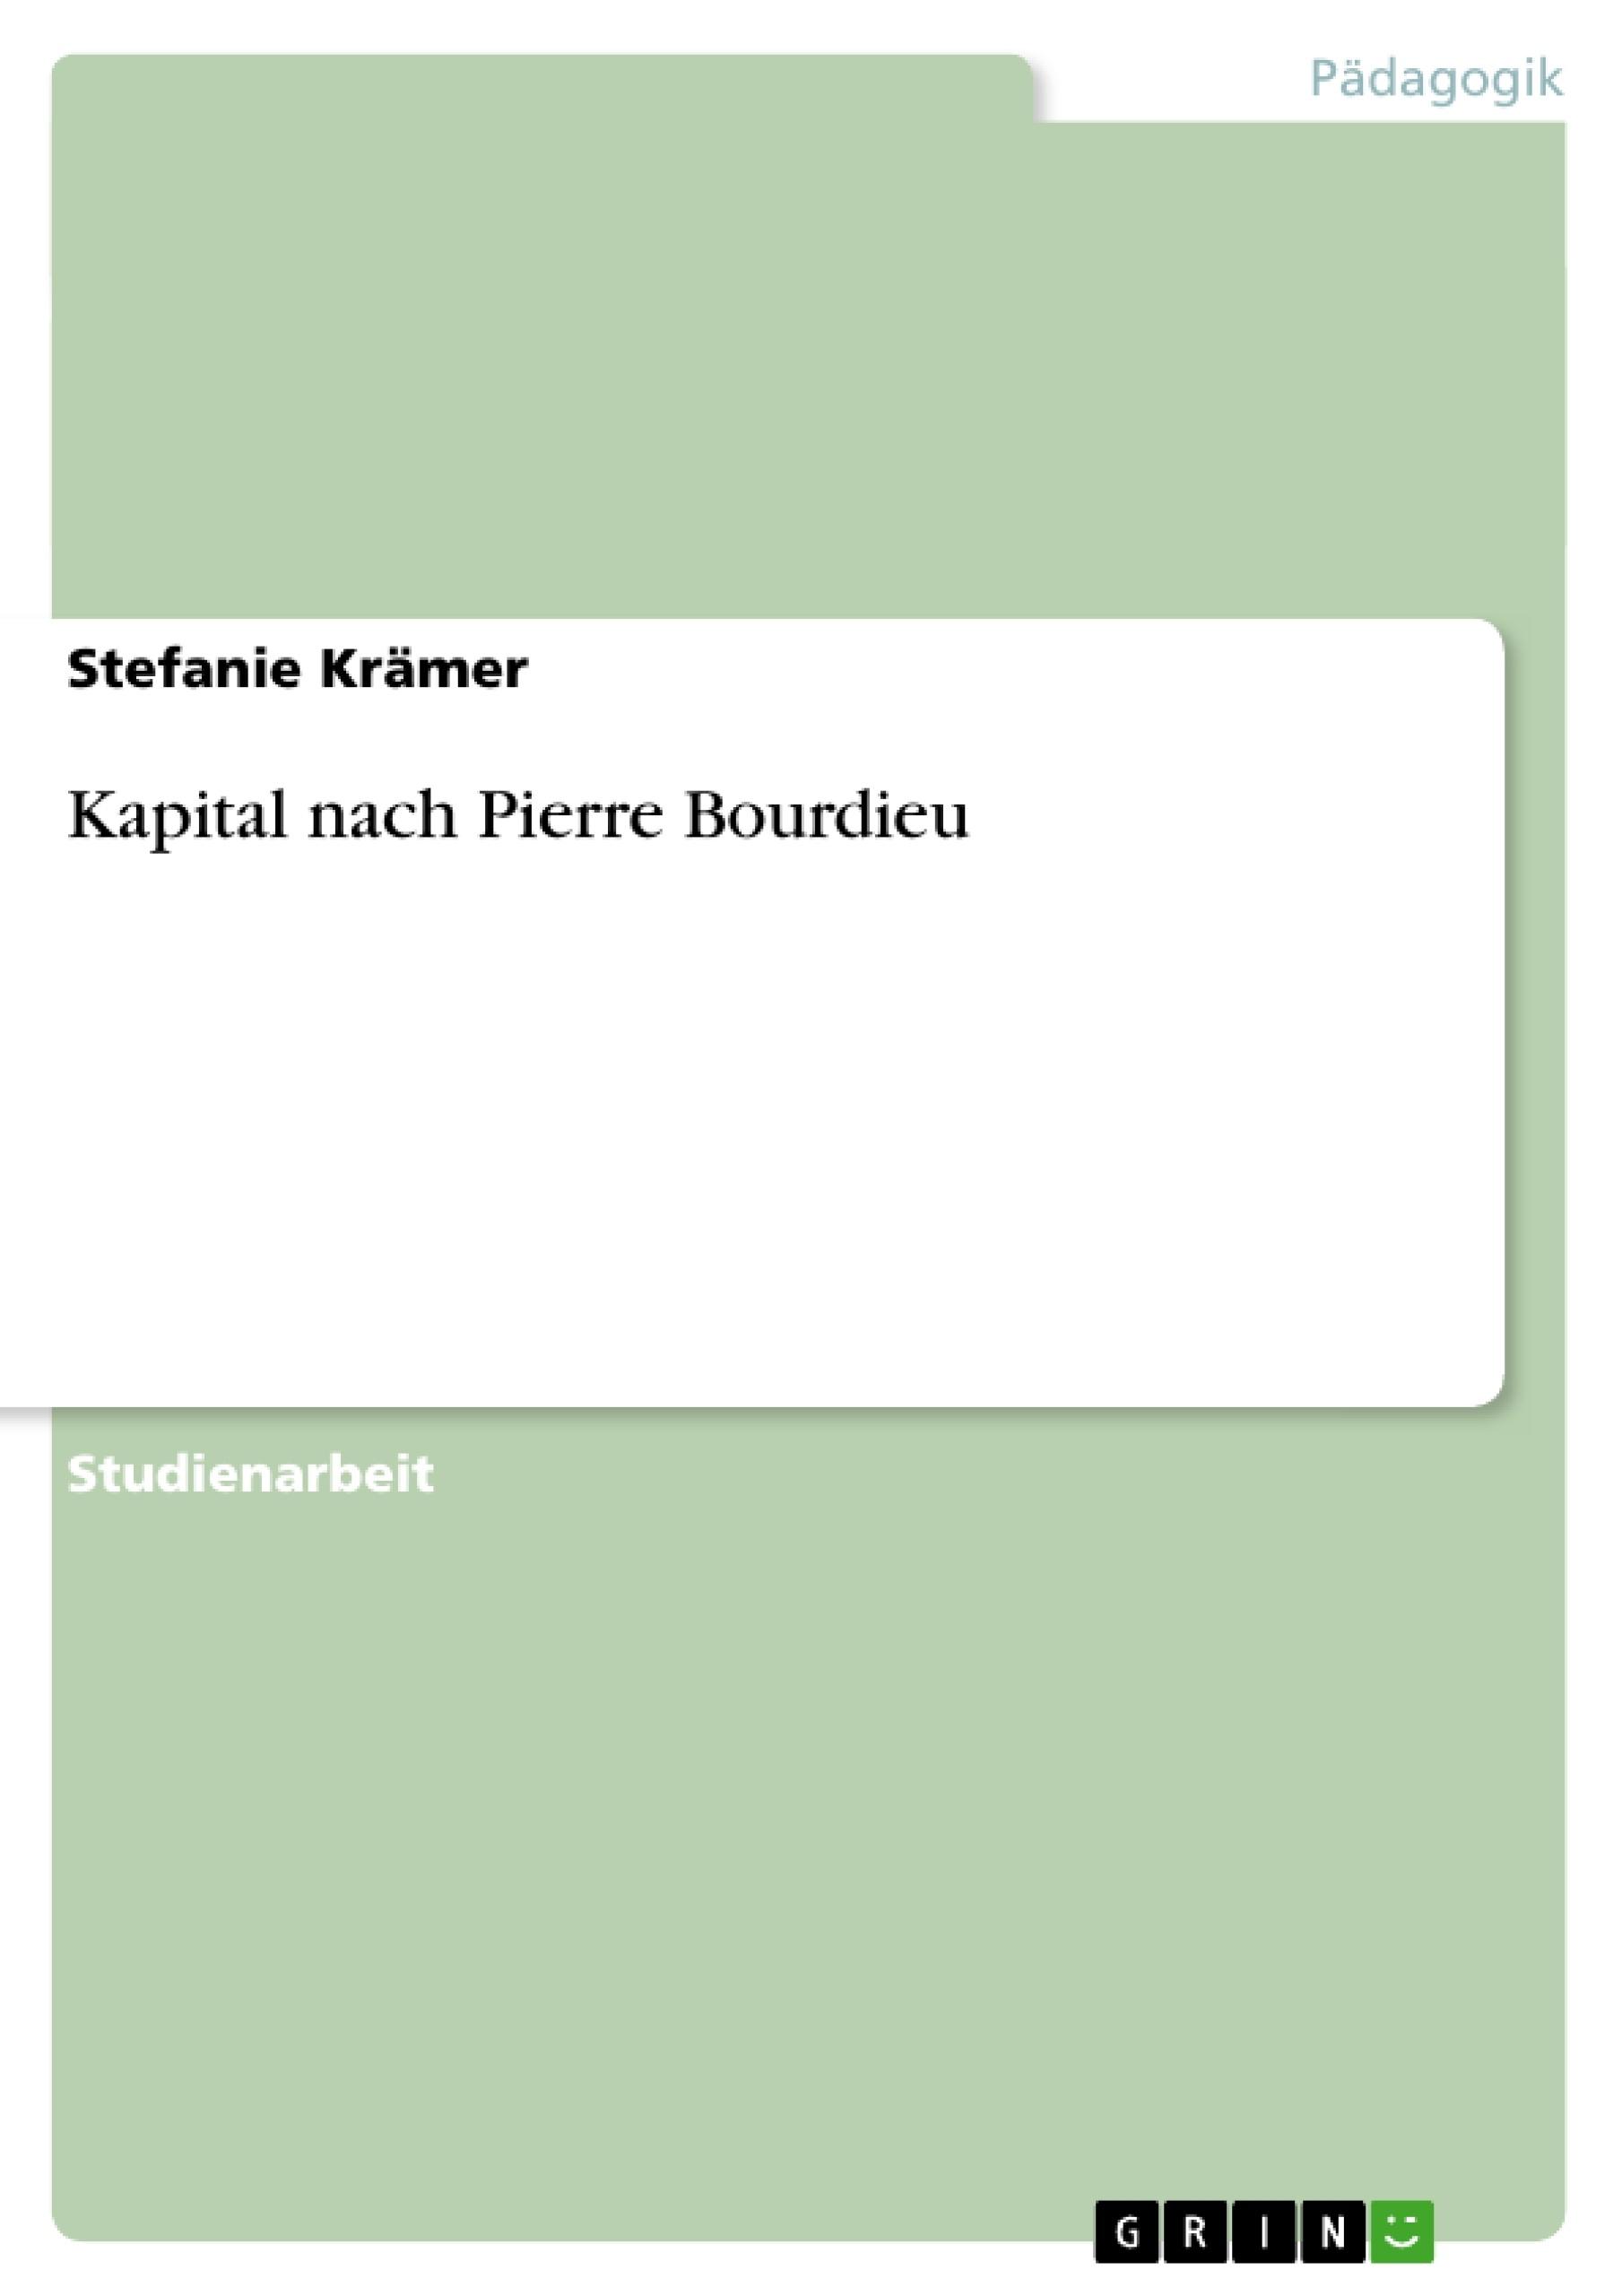 Titel: Kapital nach Pierre Bourdieu